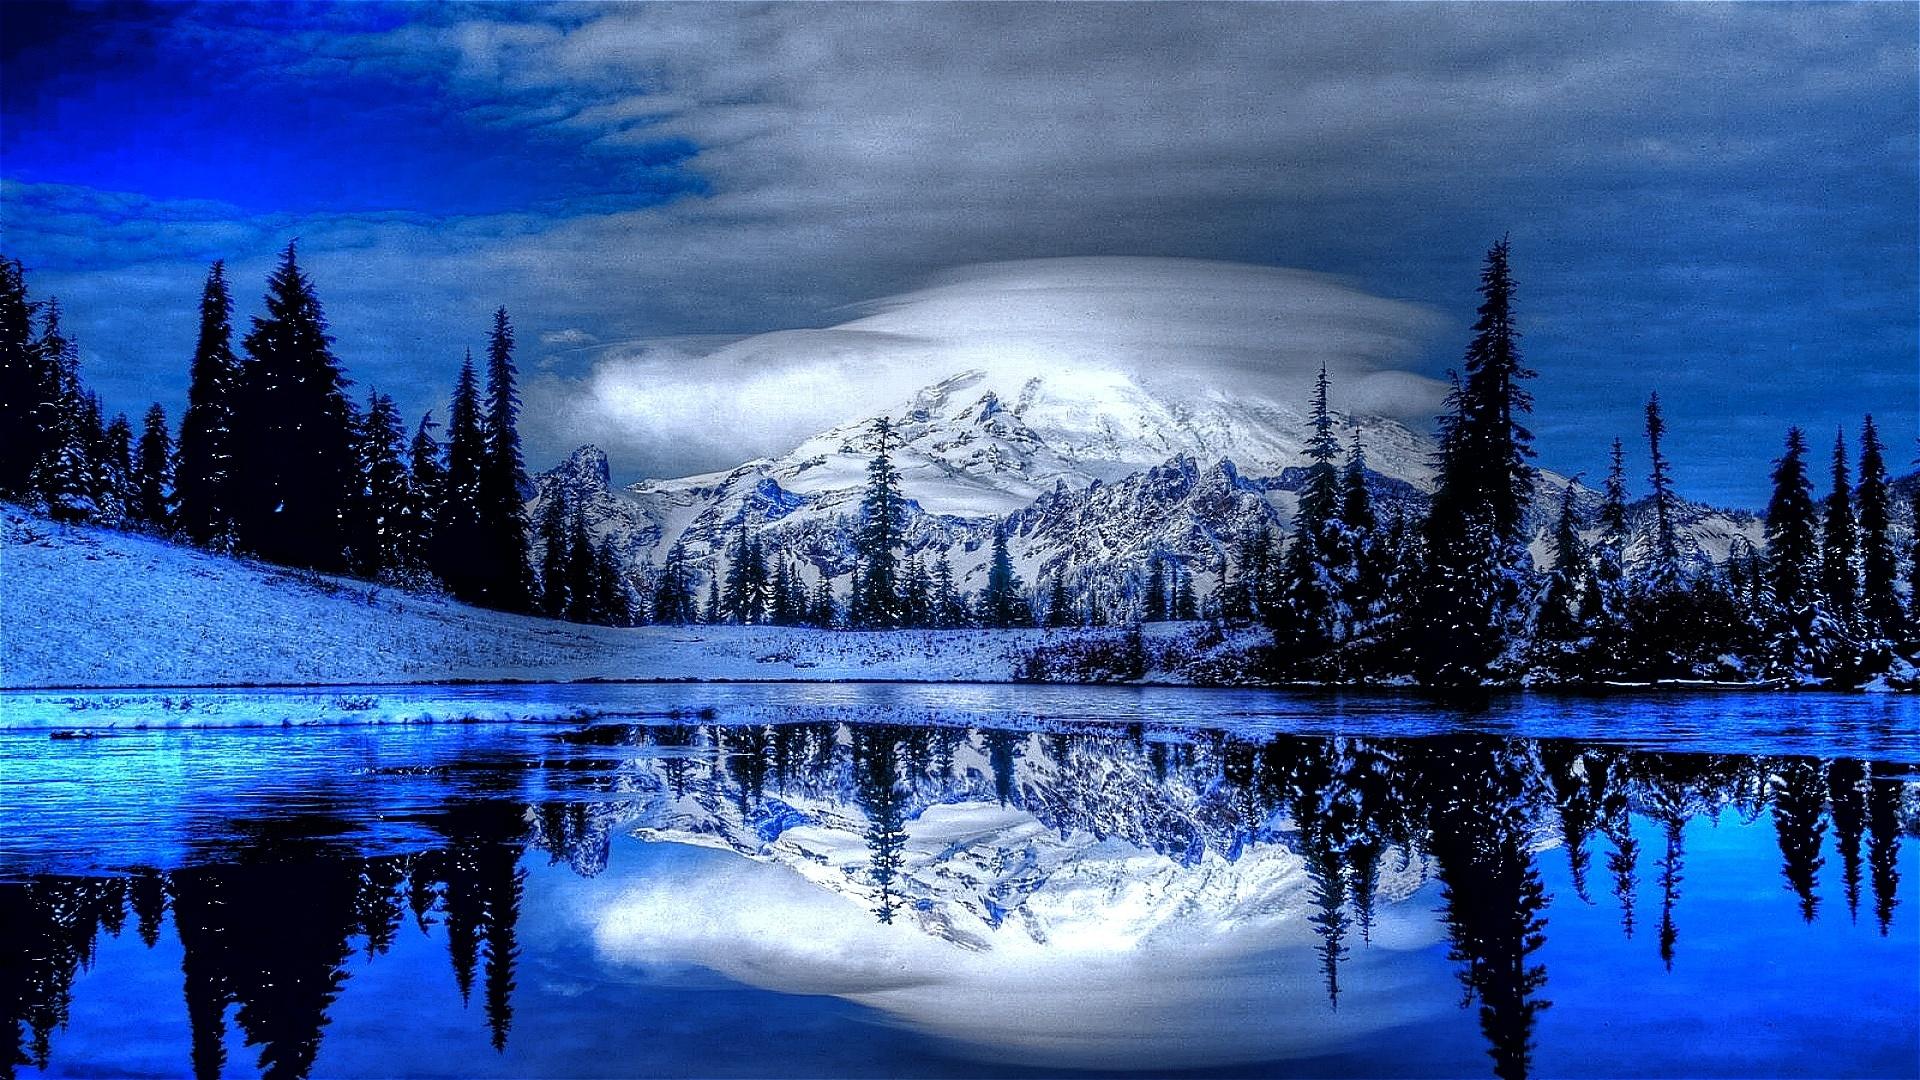 Winter Season Beautiful Hd Wallpapers Free 1920x1080